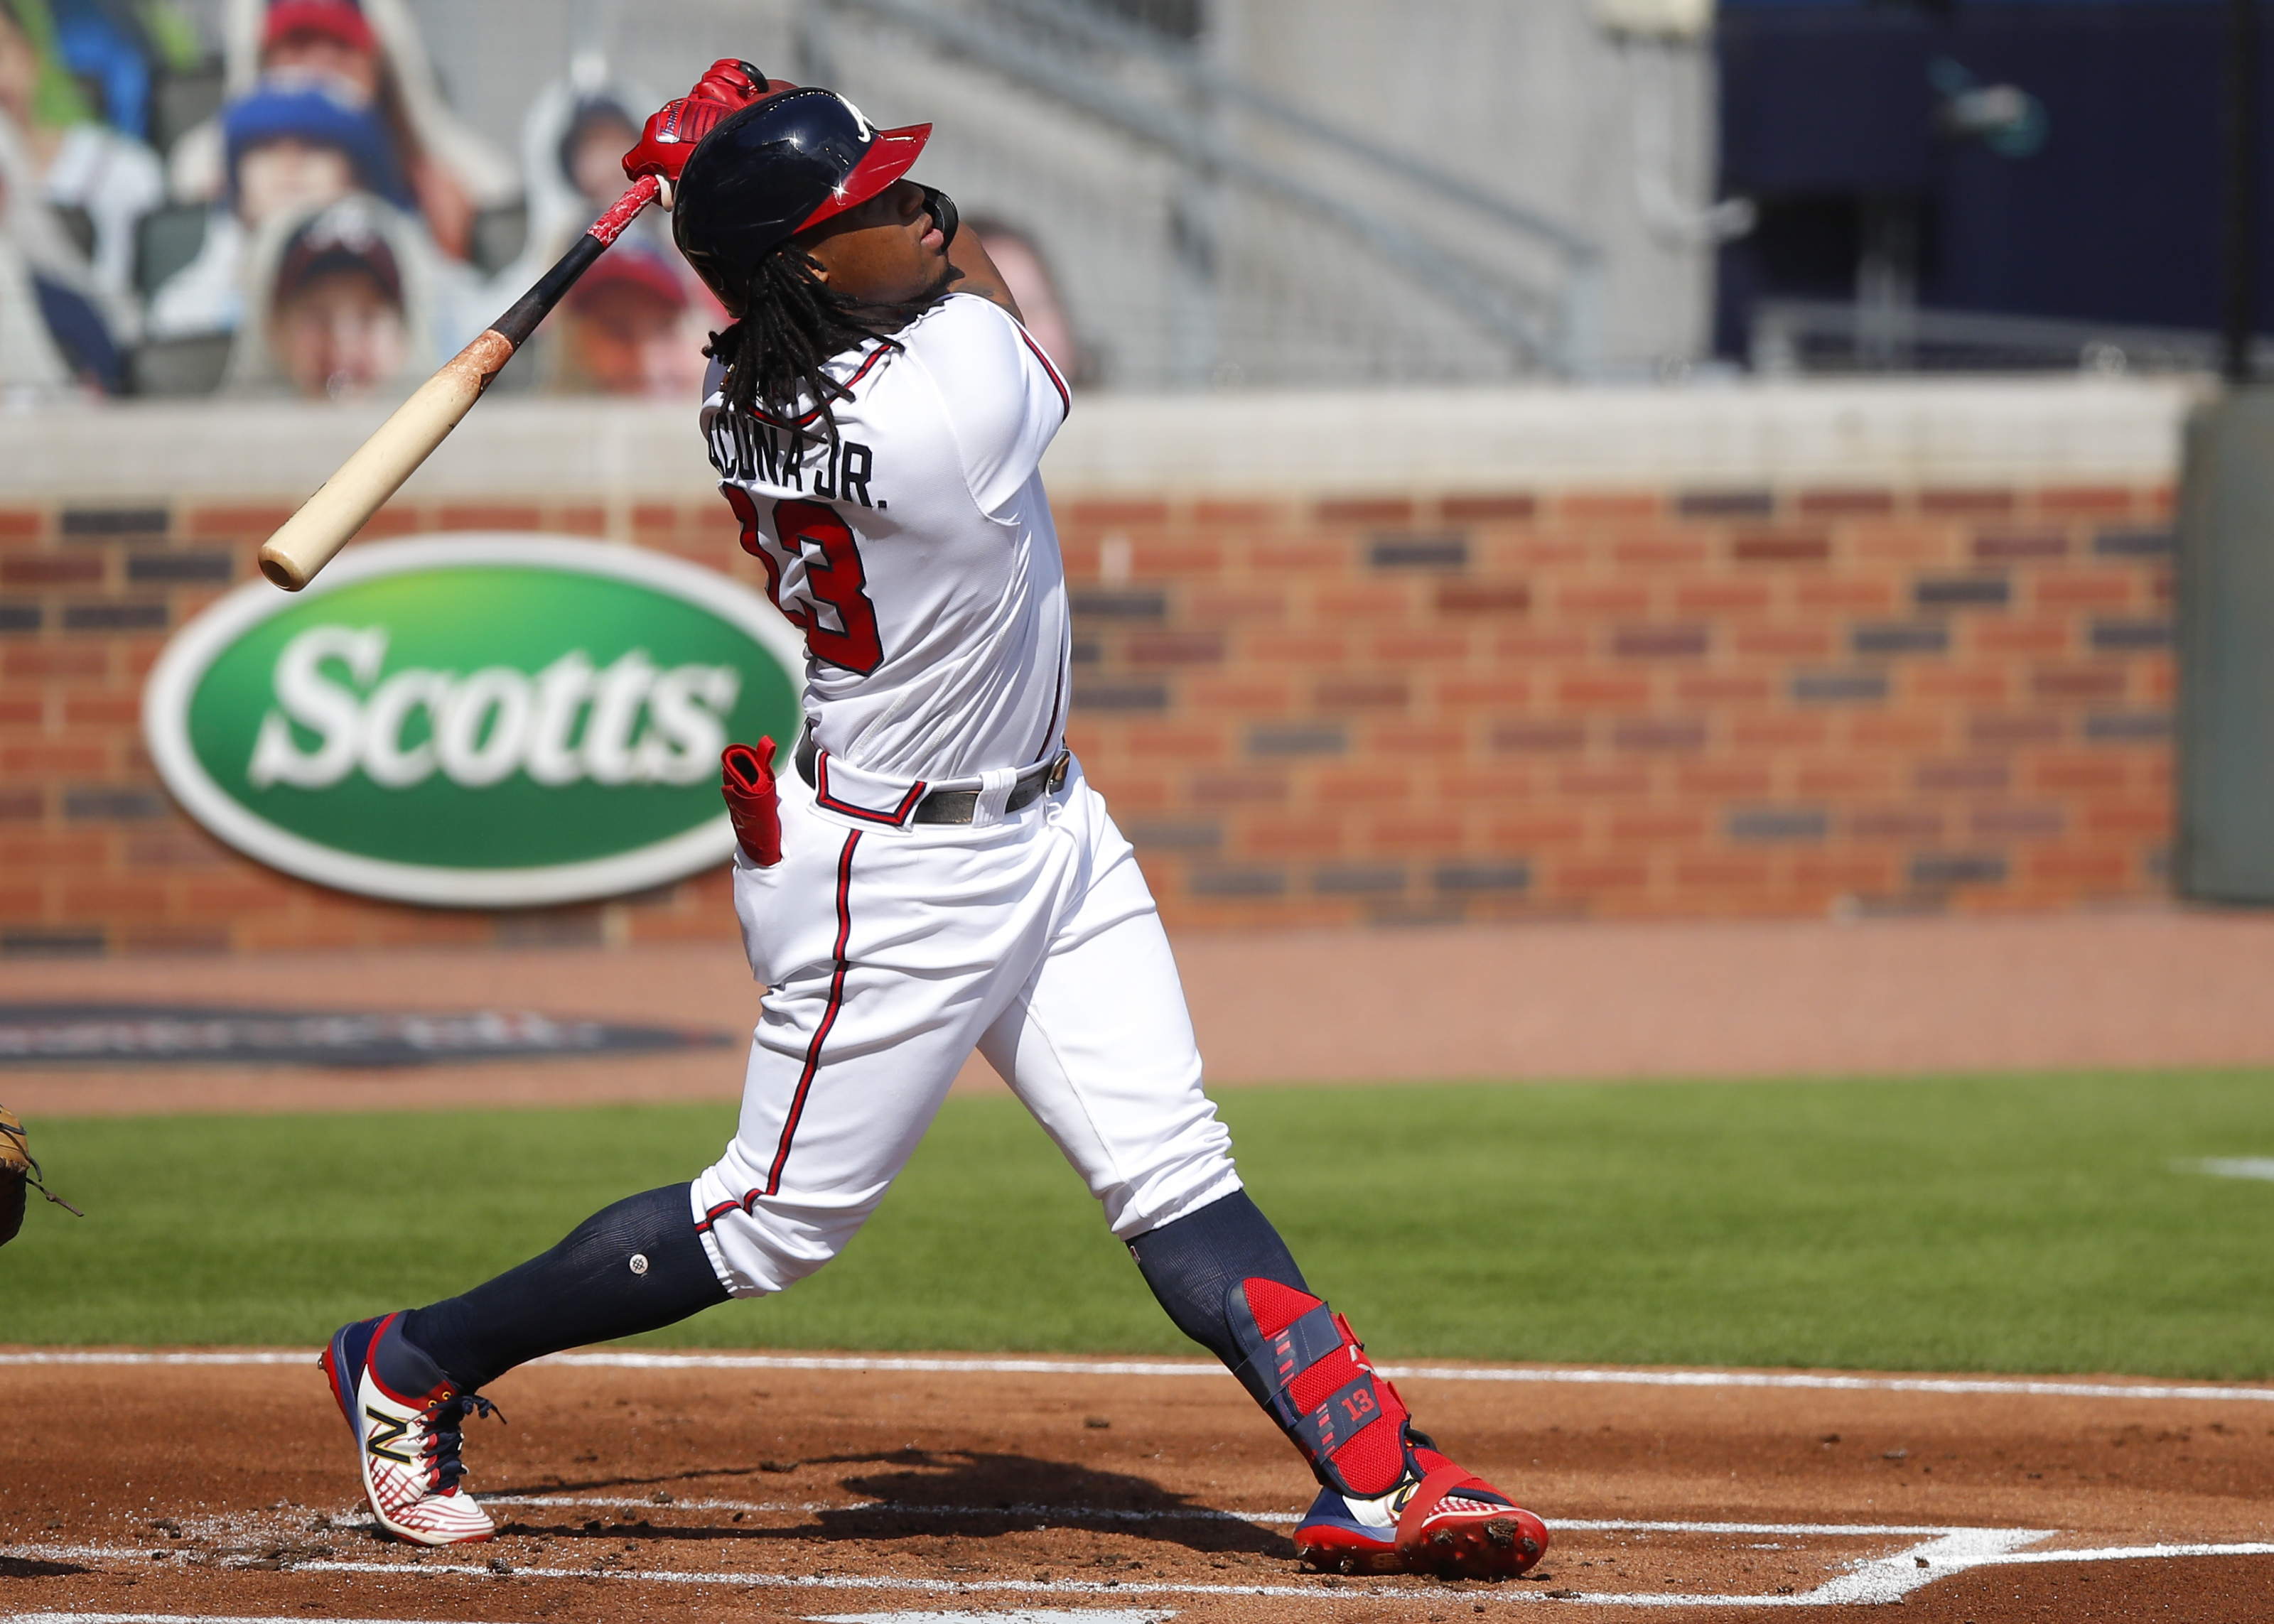 Atlanta Braves: Ronald Acuna Jr. eyeing Rickey Henderson